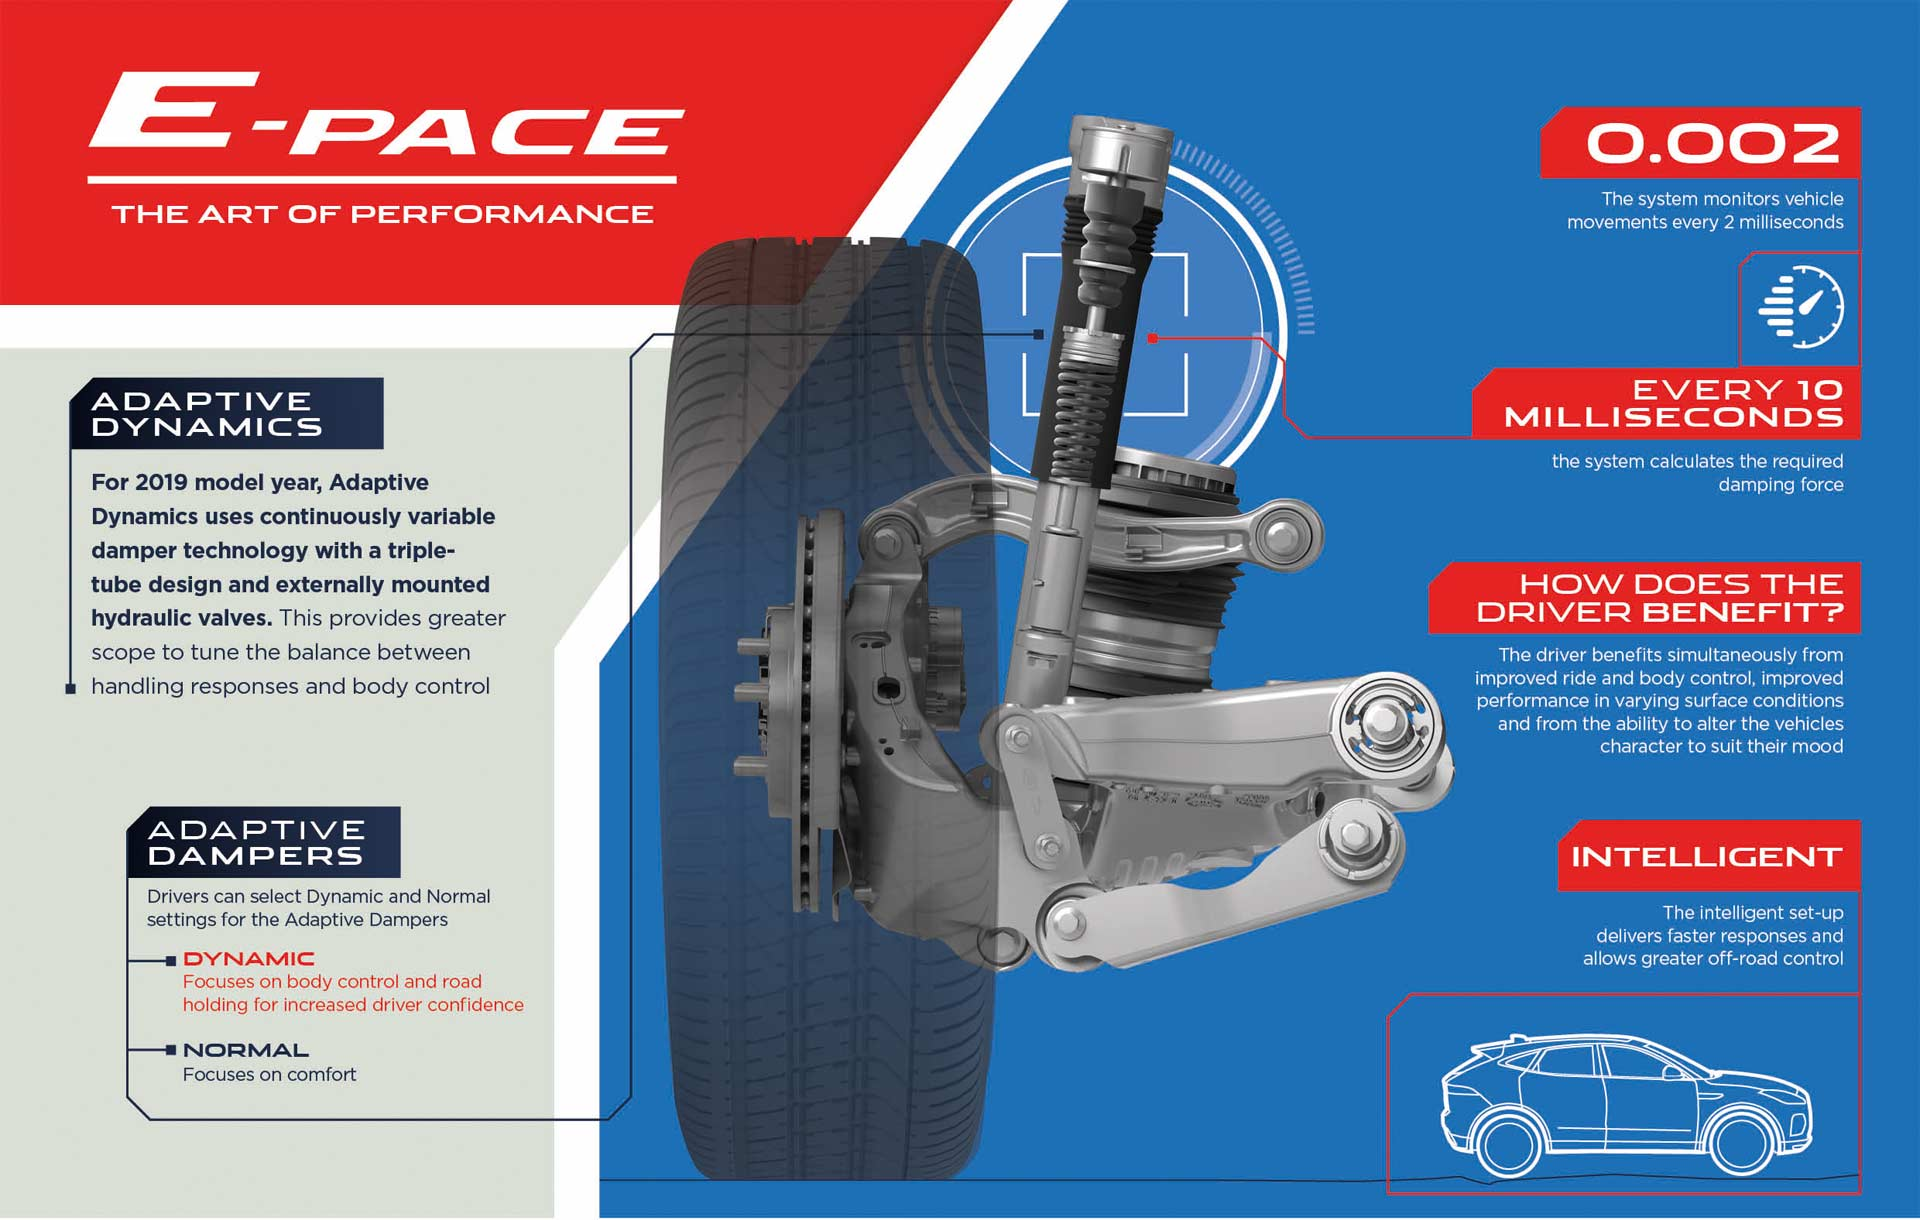 Jaguar-E-Pace-adaptive-dynamics